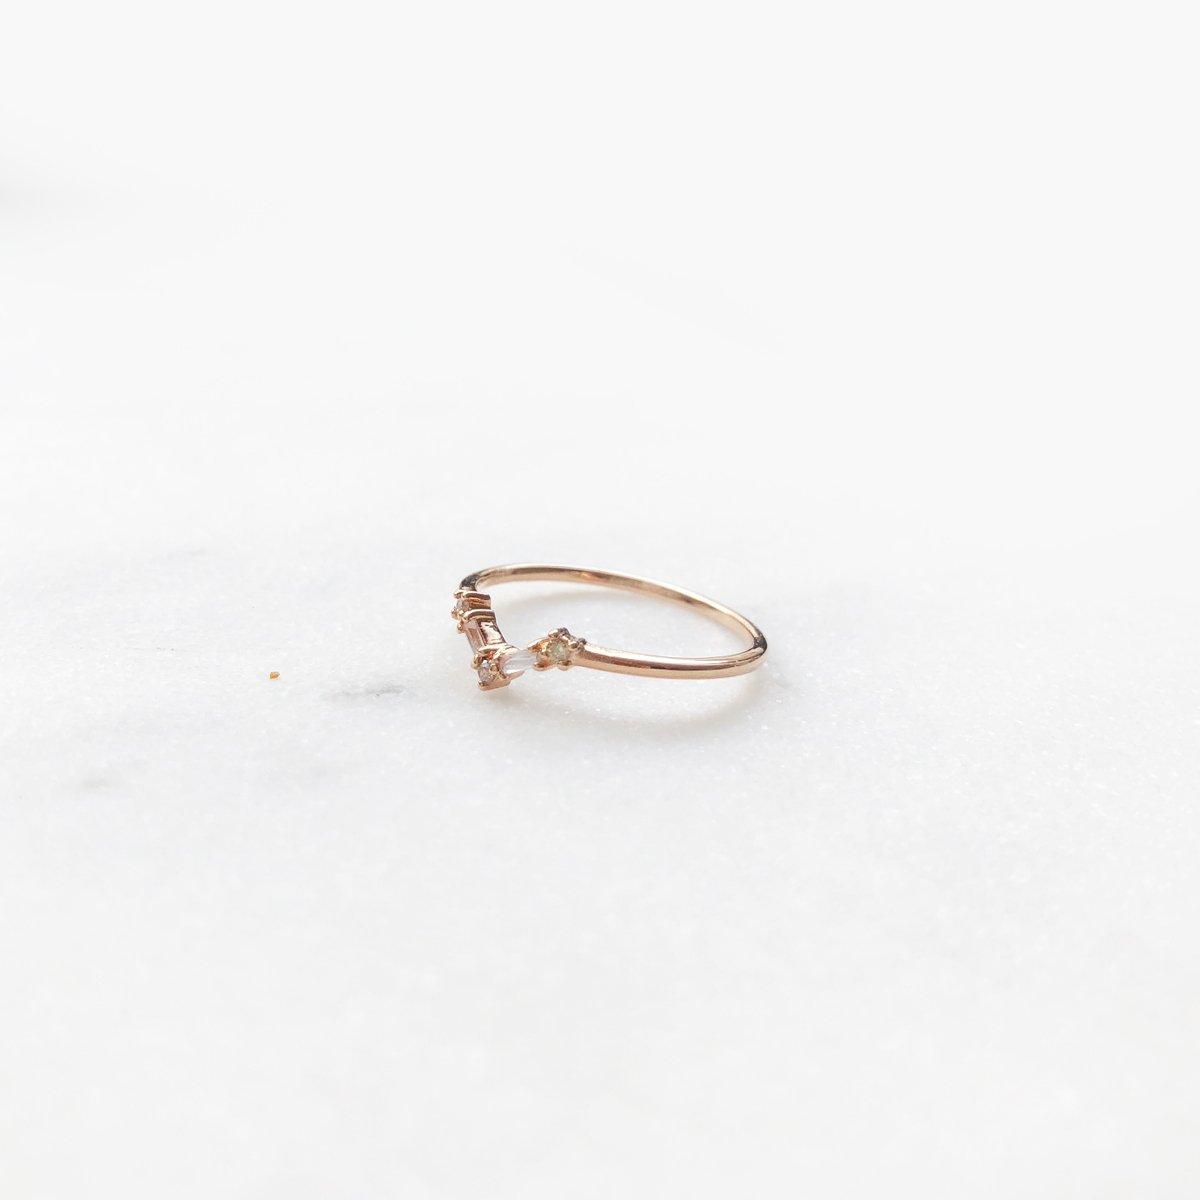 Image of Mini Deco Baguette Ring